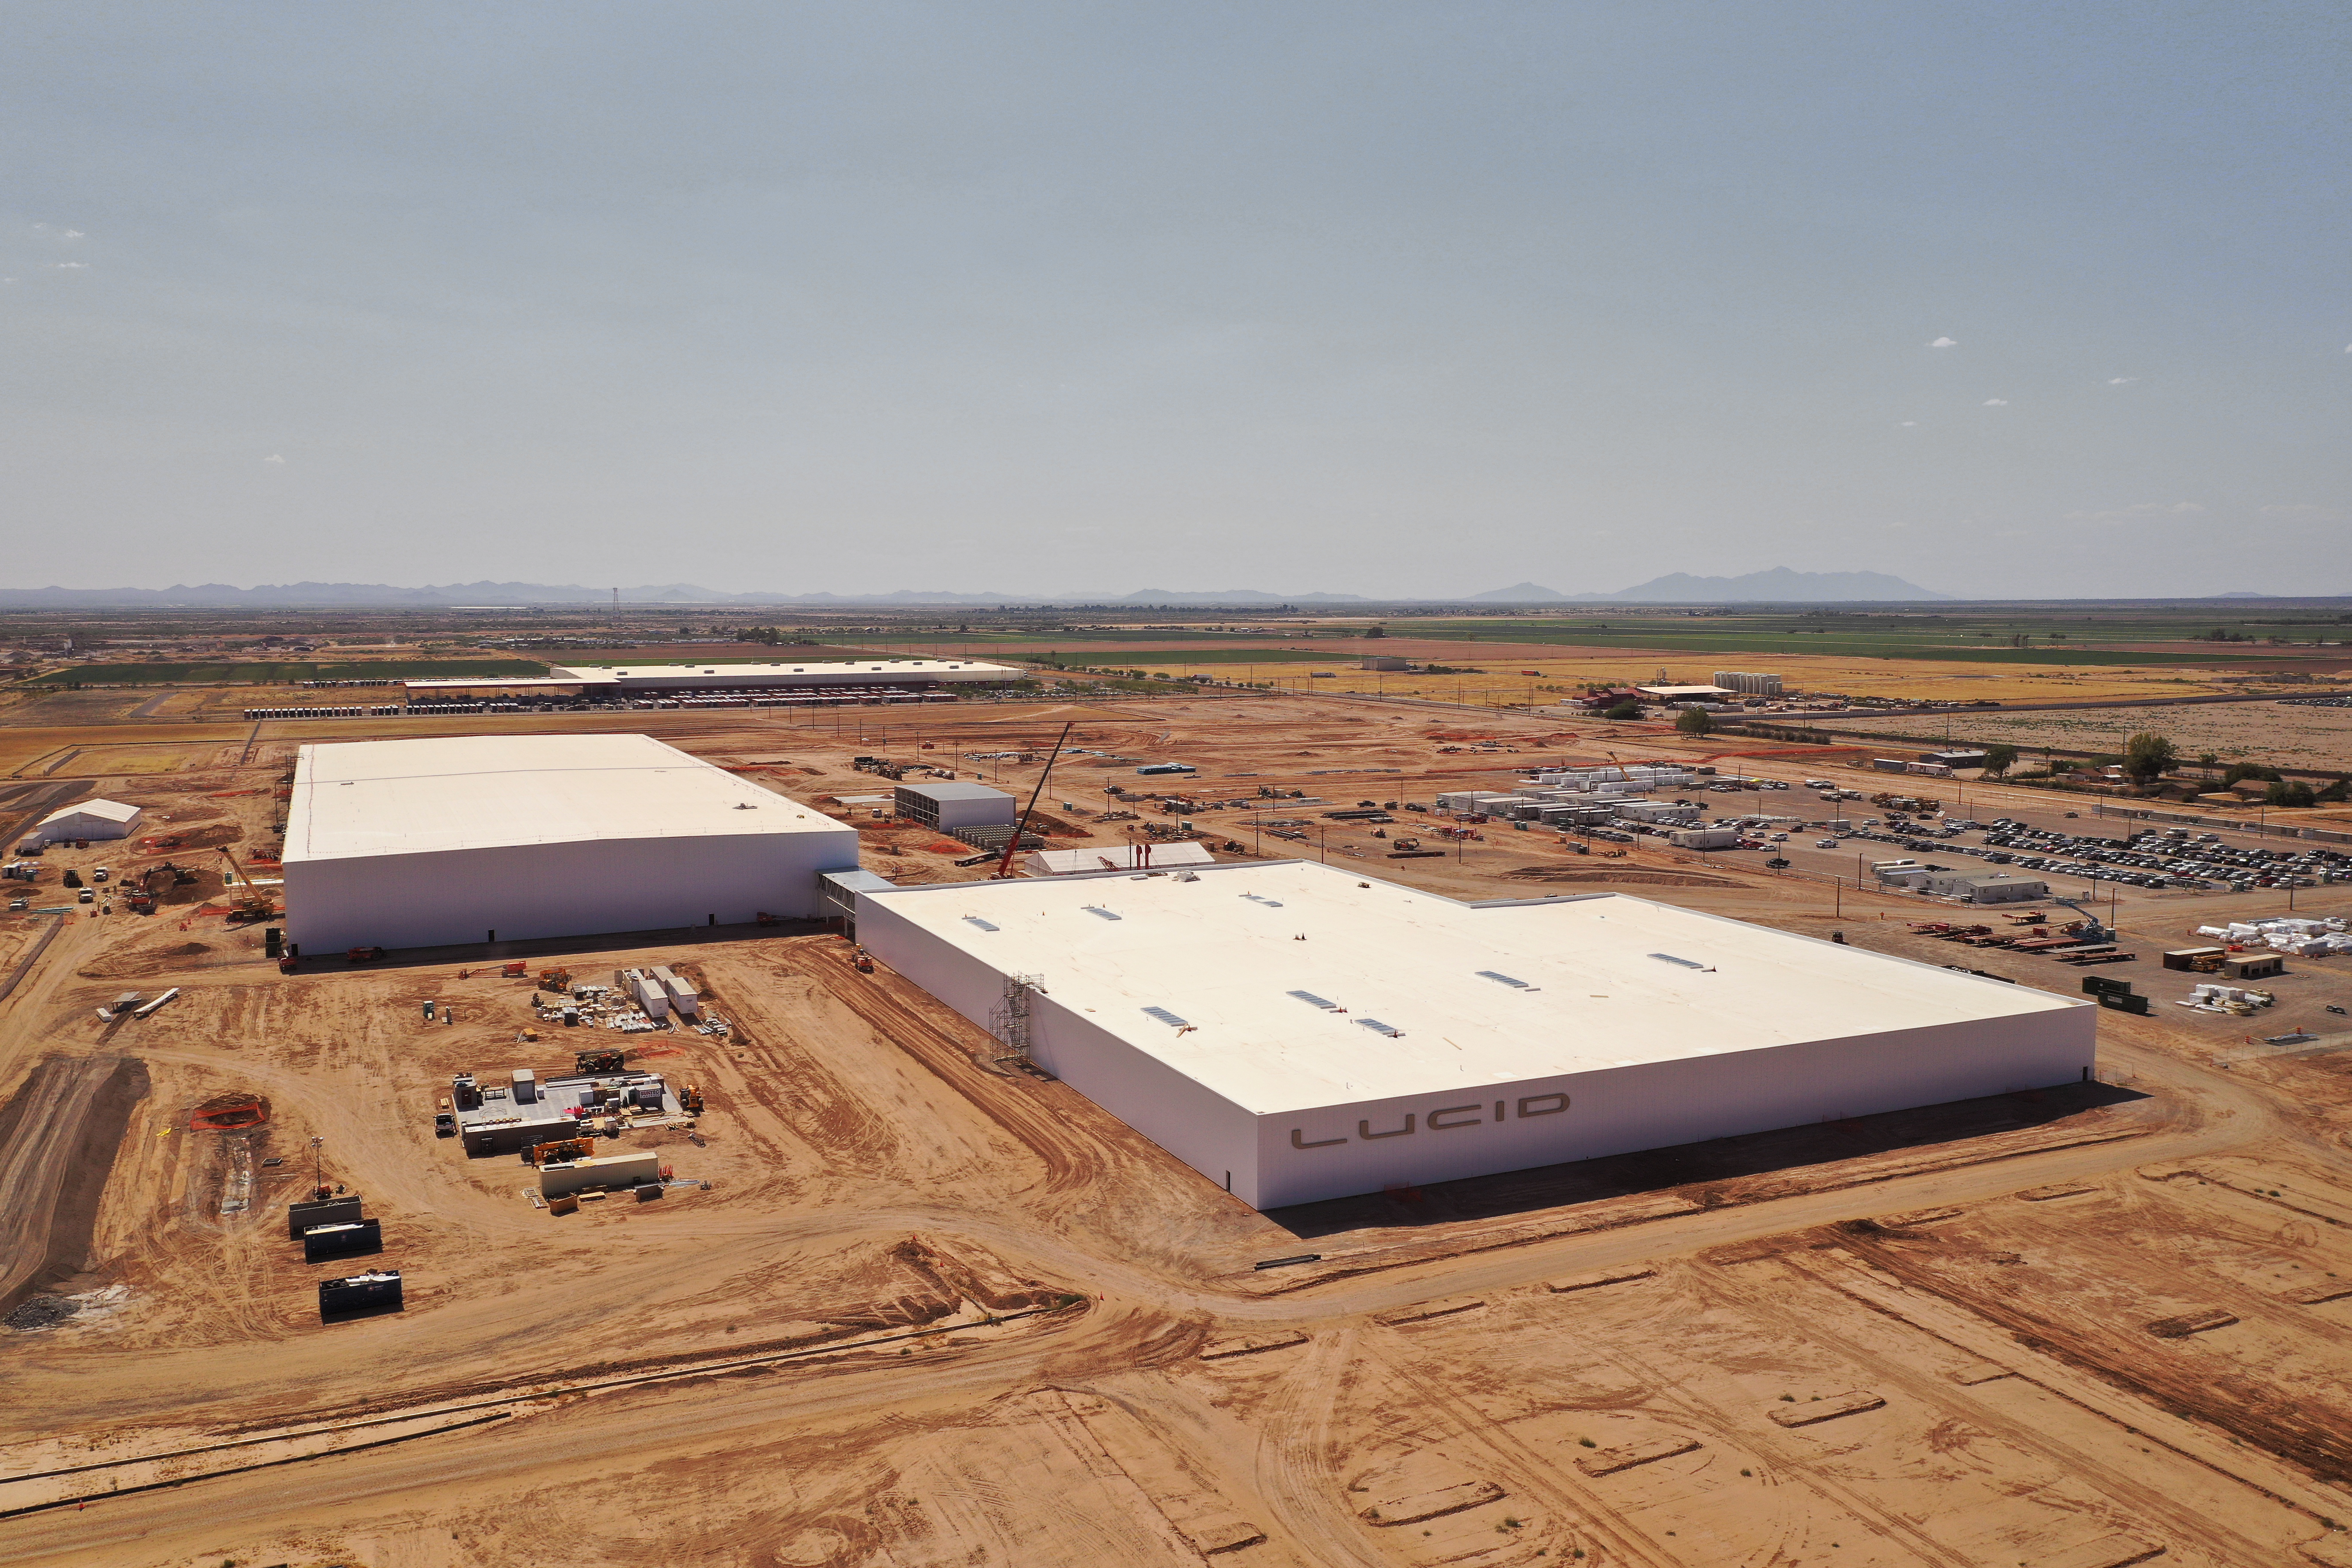 Lucid motors factory